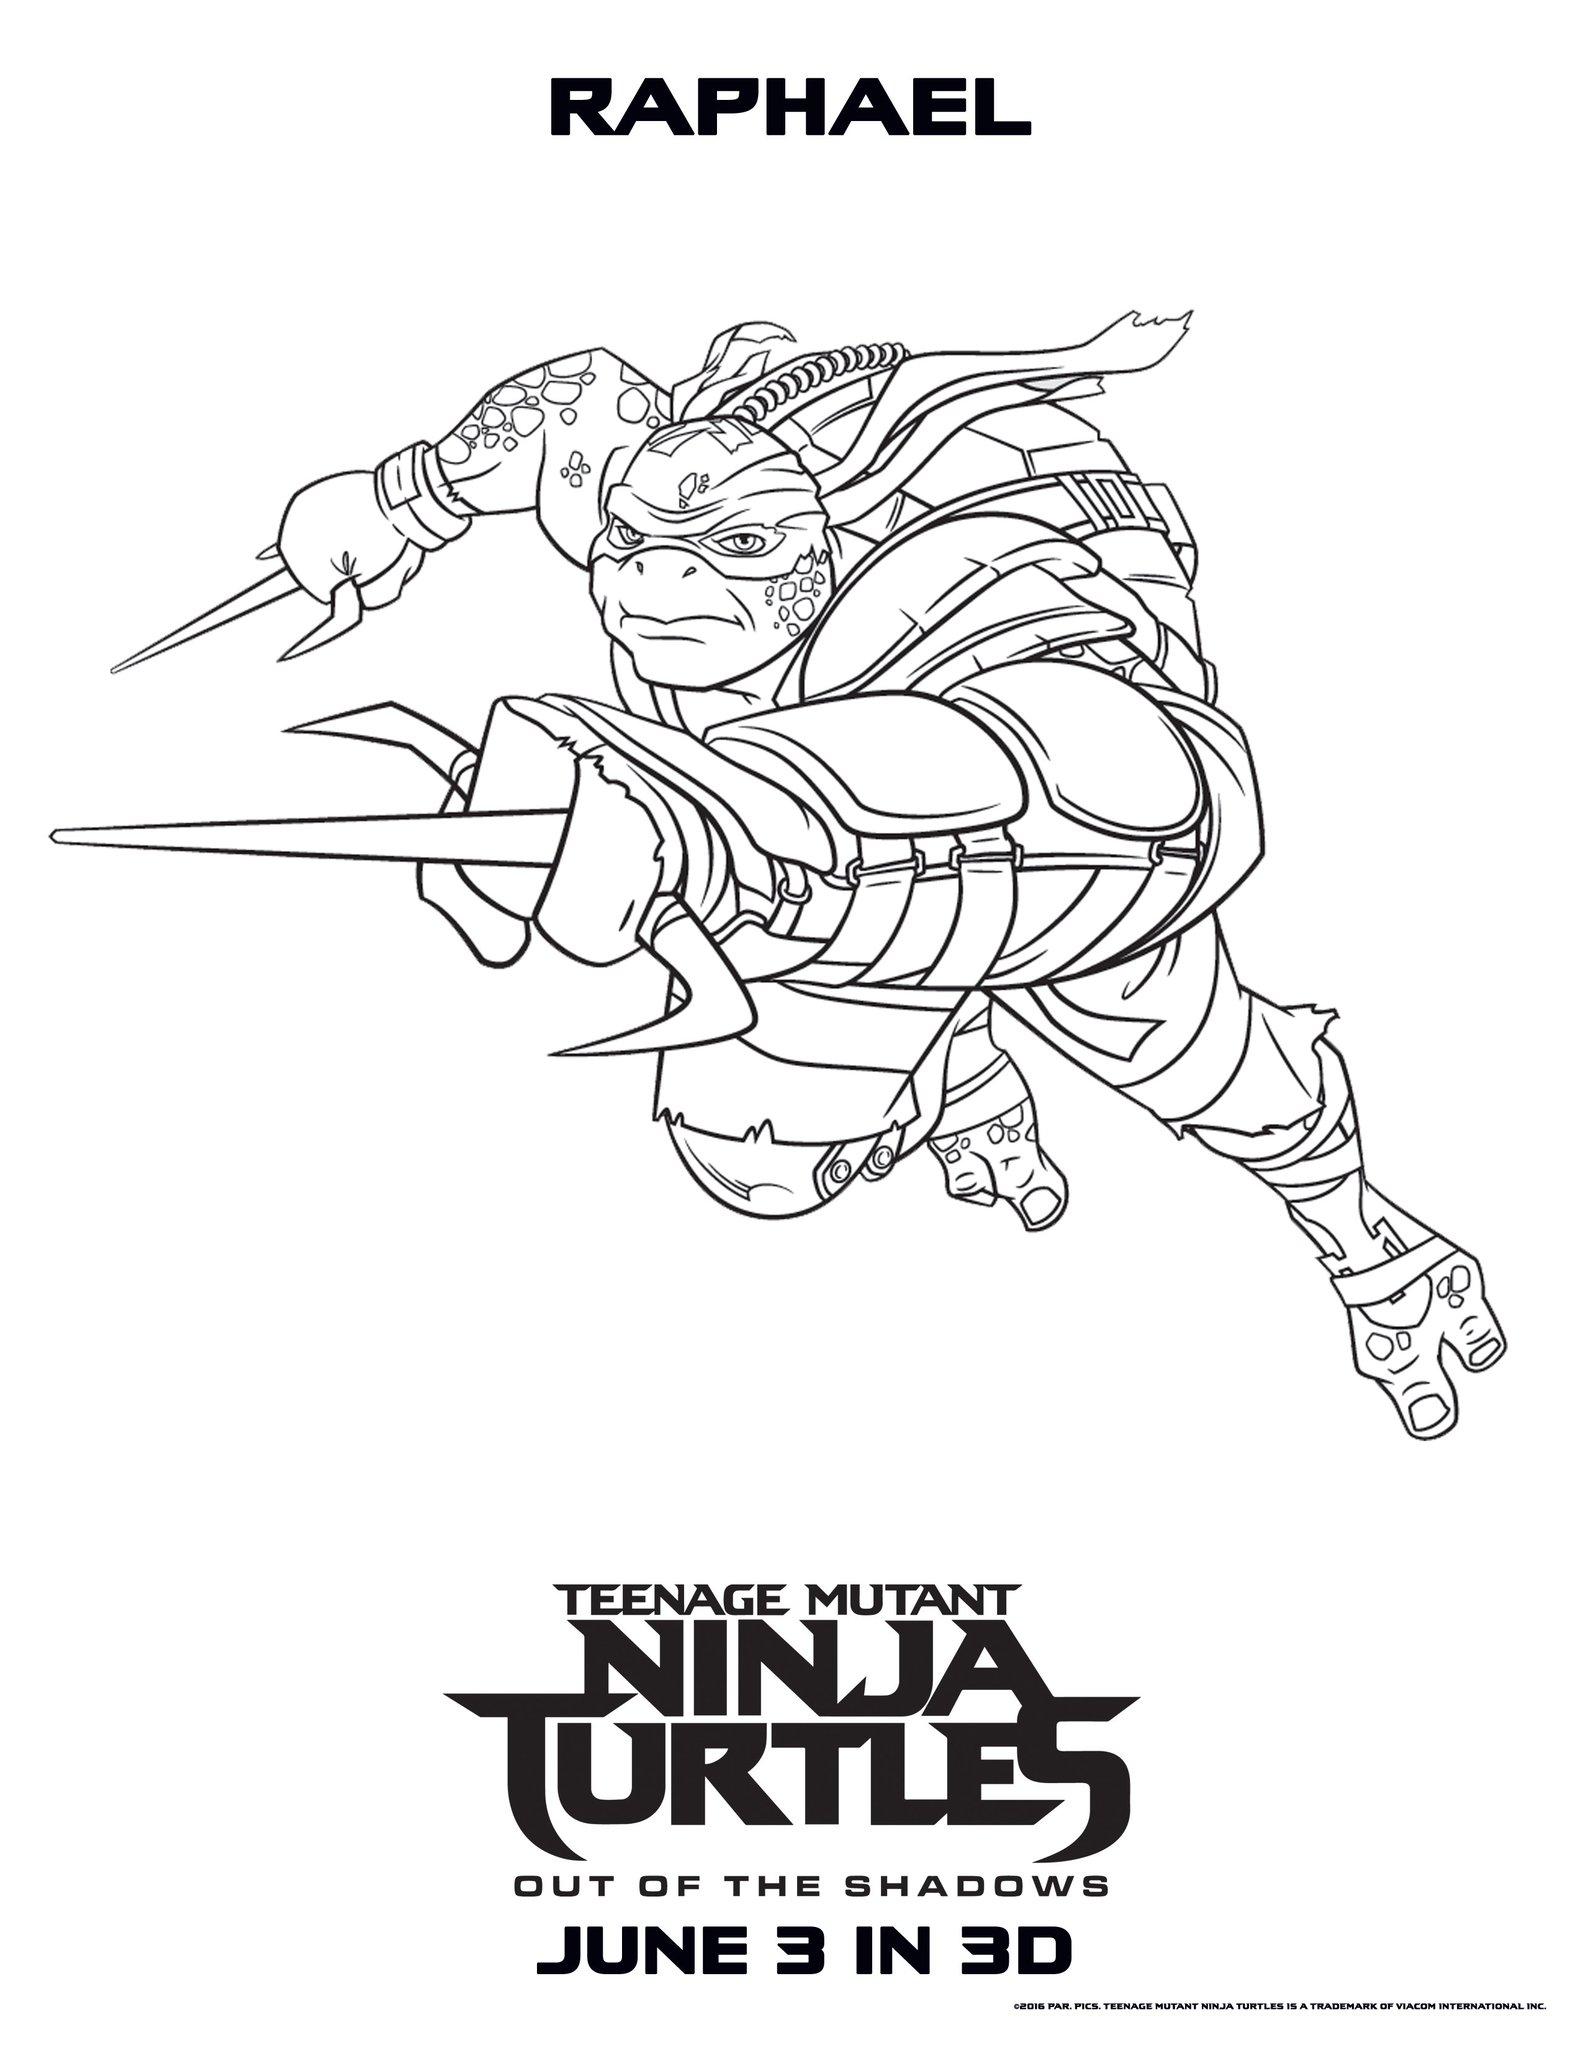 Tmnt Fan 86 On Twitter Quot Teenage Mutant Ninja Turtles Out